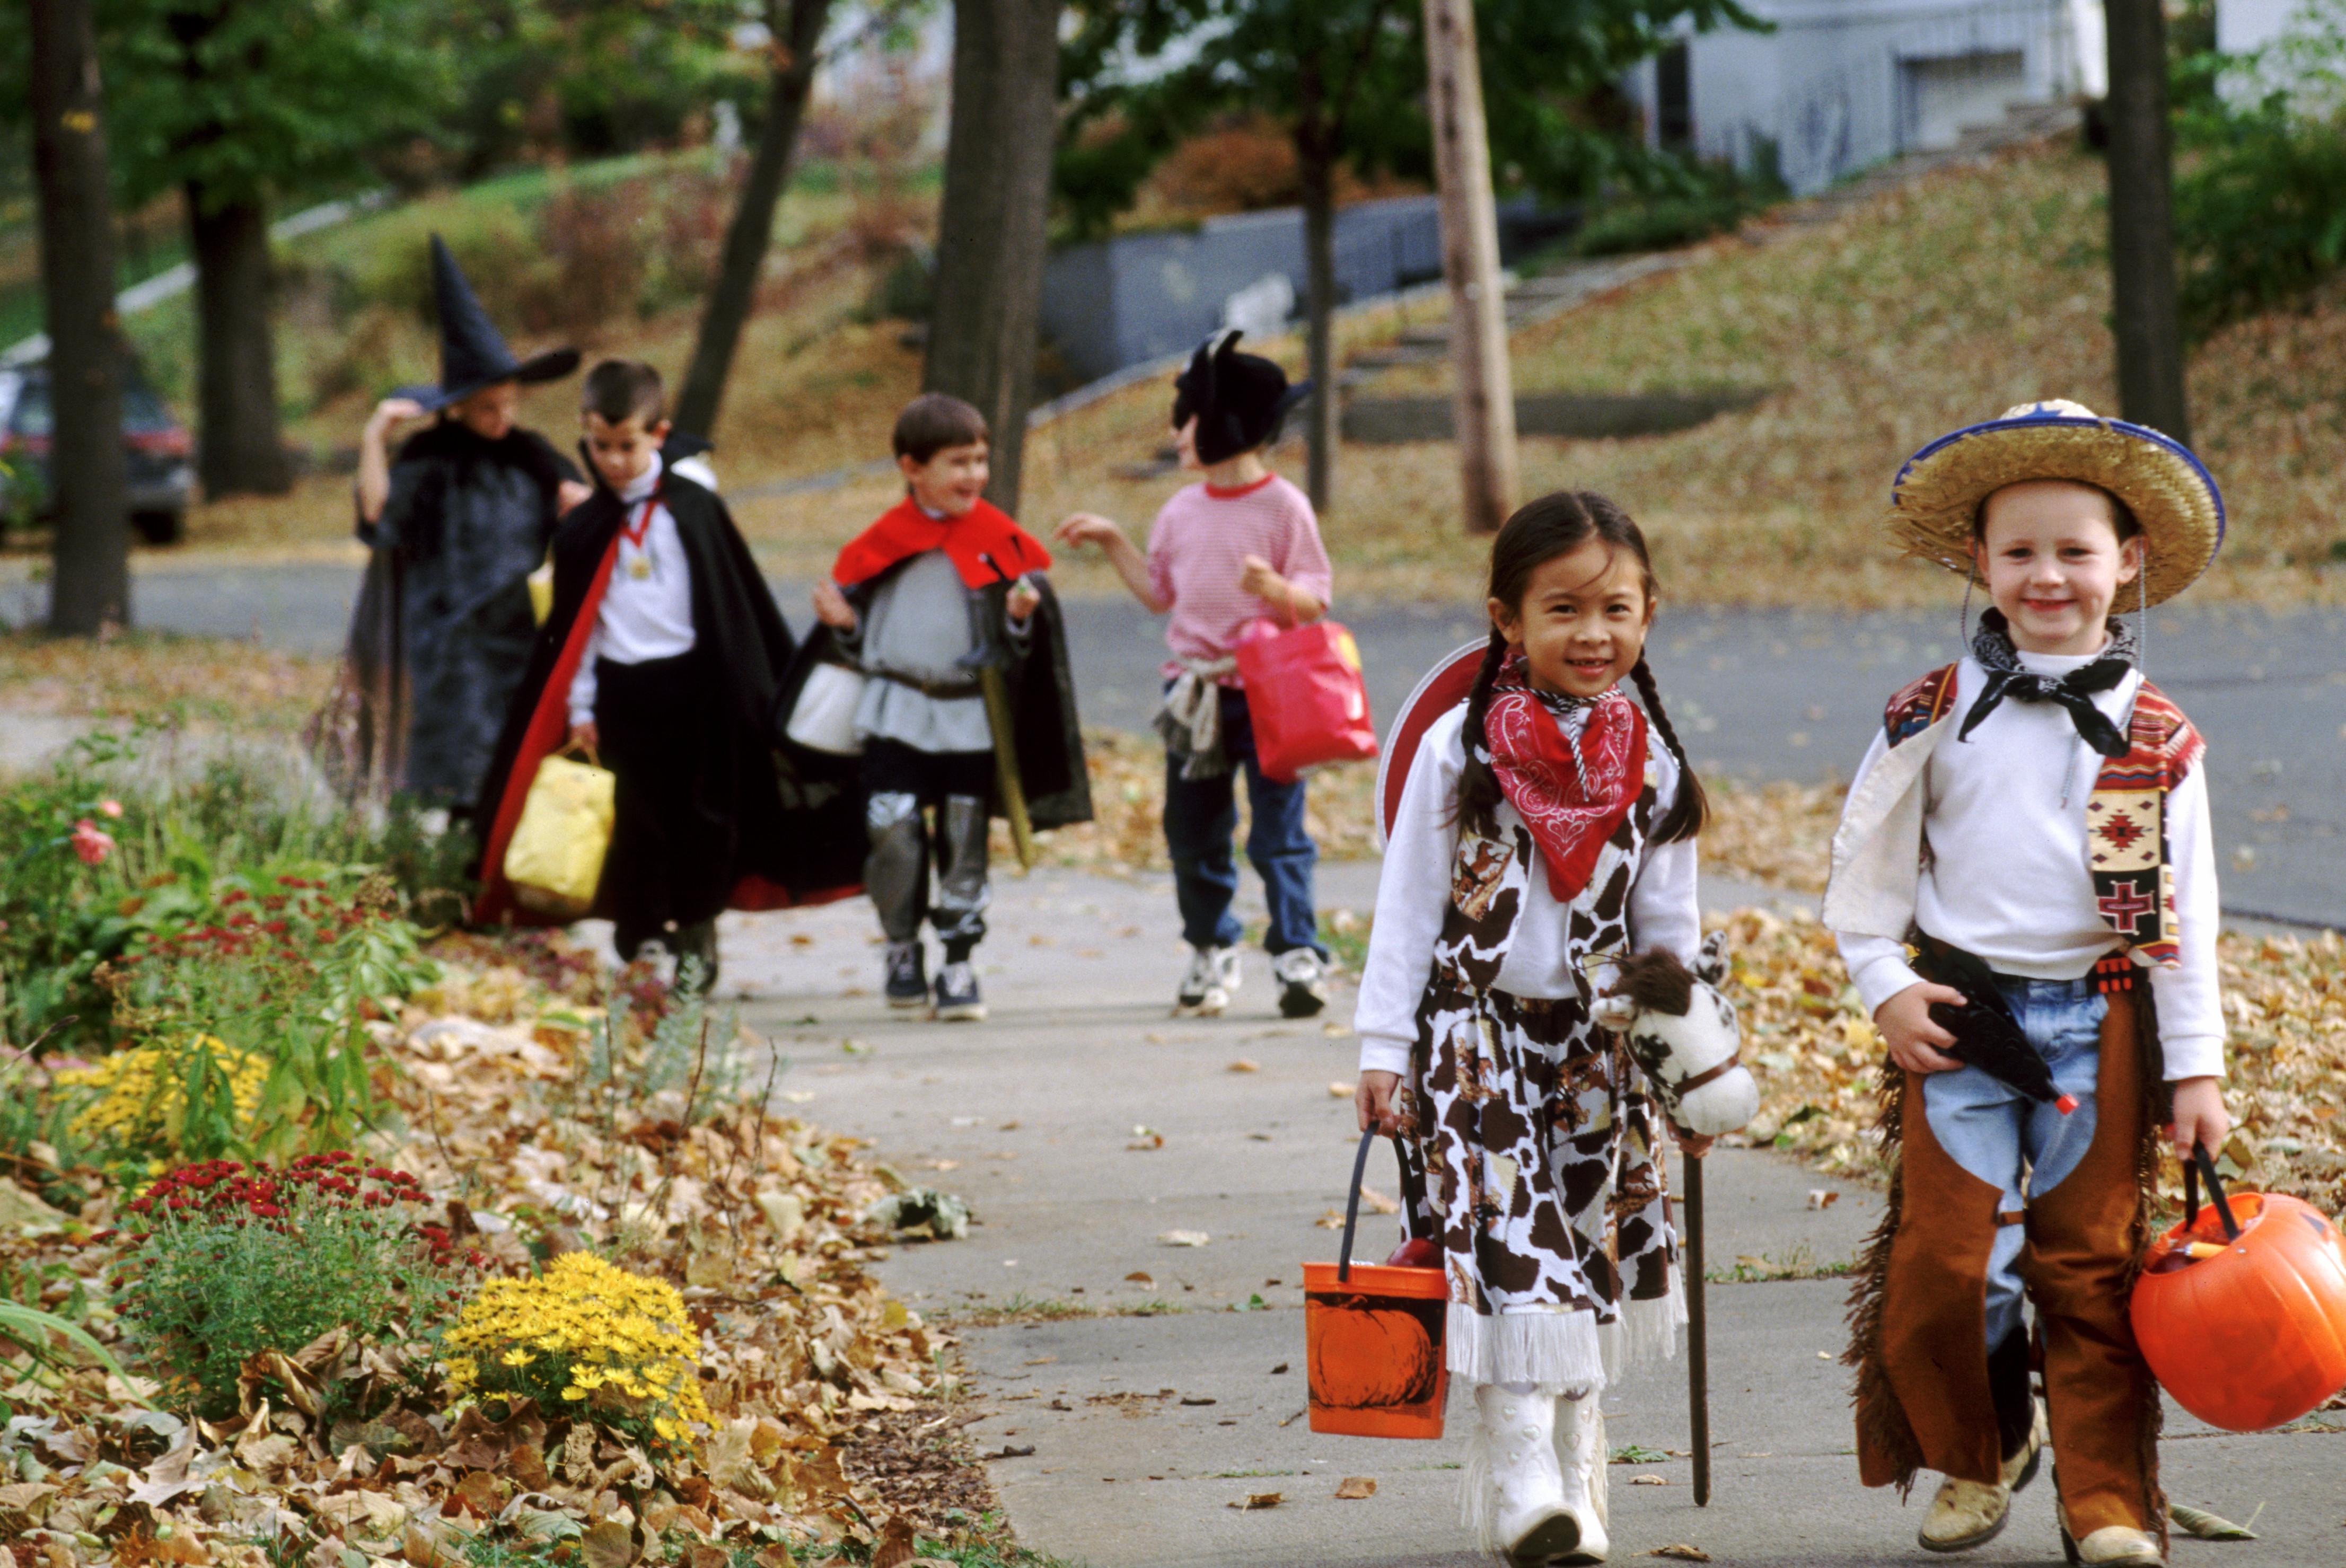 halloween trick or treating costumes children  sc 1 th 183 & trick-or-treating-children - Halloween Pictures - Halloween ...